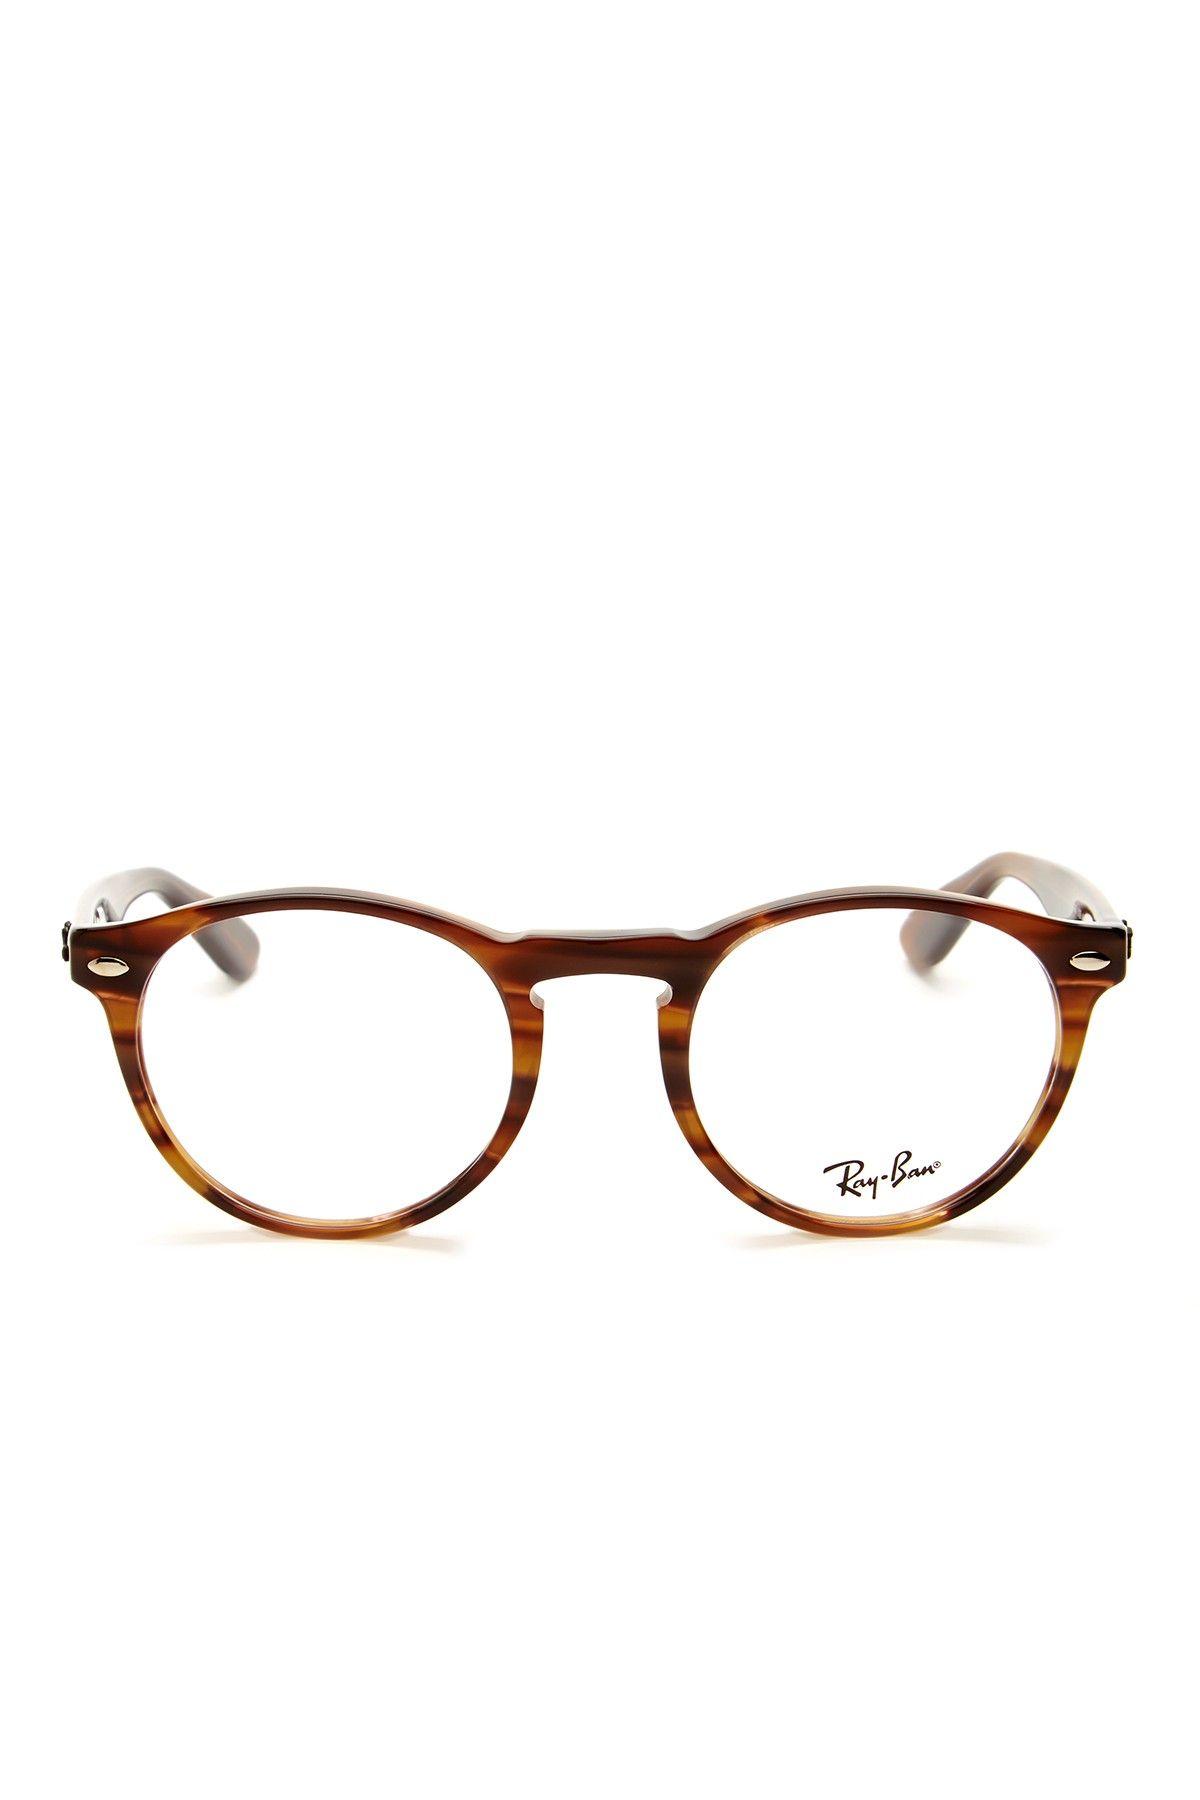 Ray Ban Men\'s Striped Brown Acetate Eyeglasses   Stuff I\'d wear ...